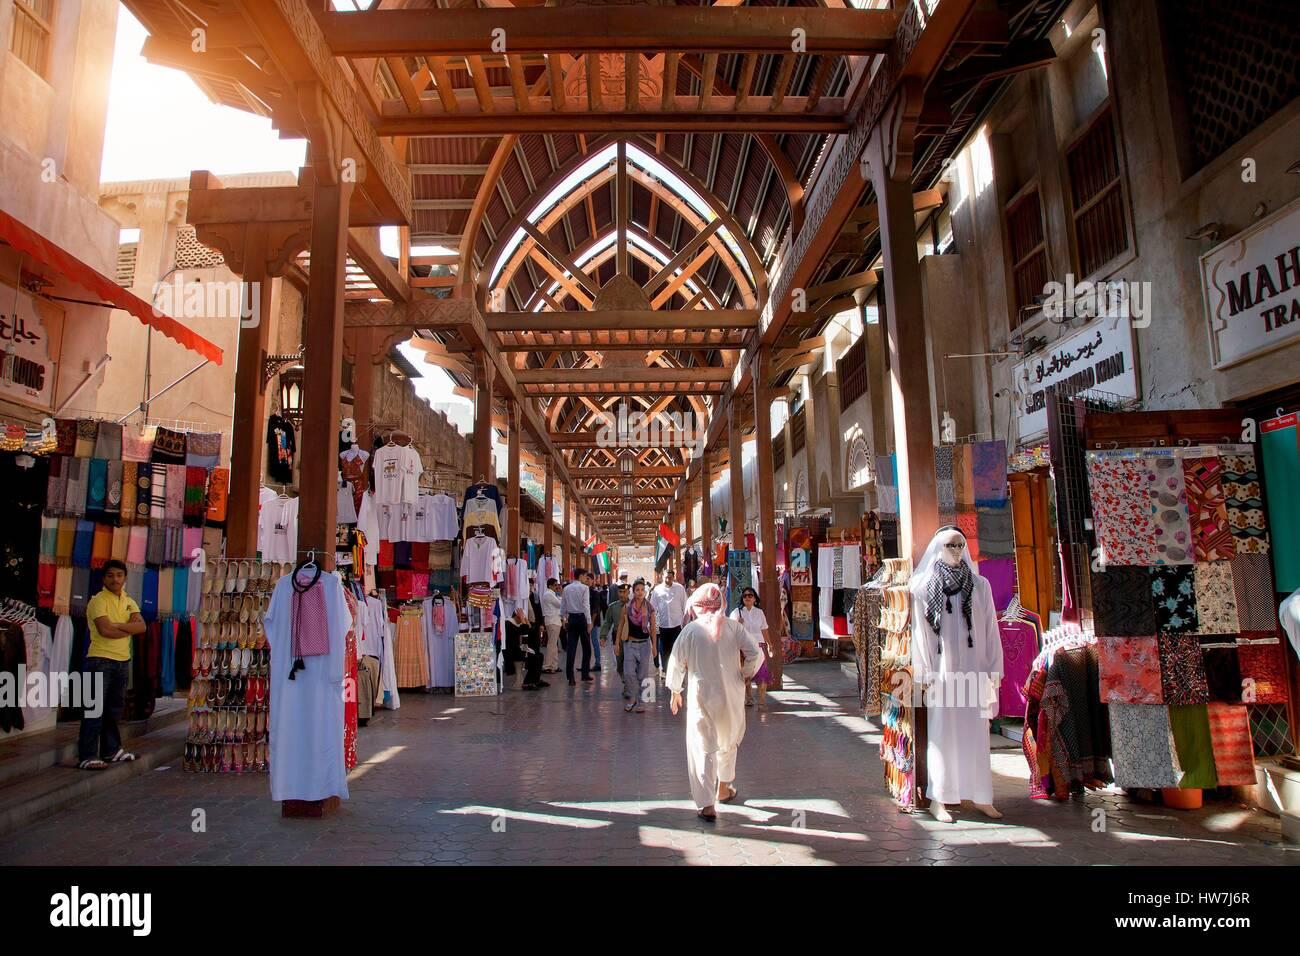 United Arab Emirates, Dubai, Bur Dubai Souq - Stock Image